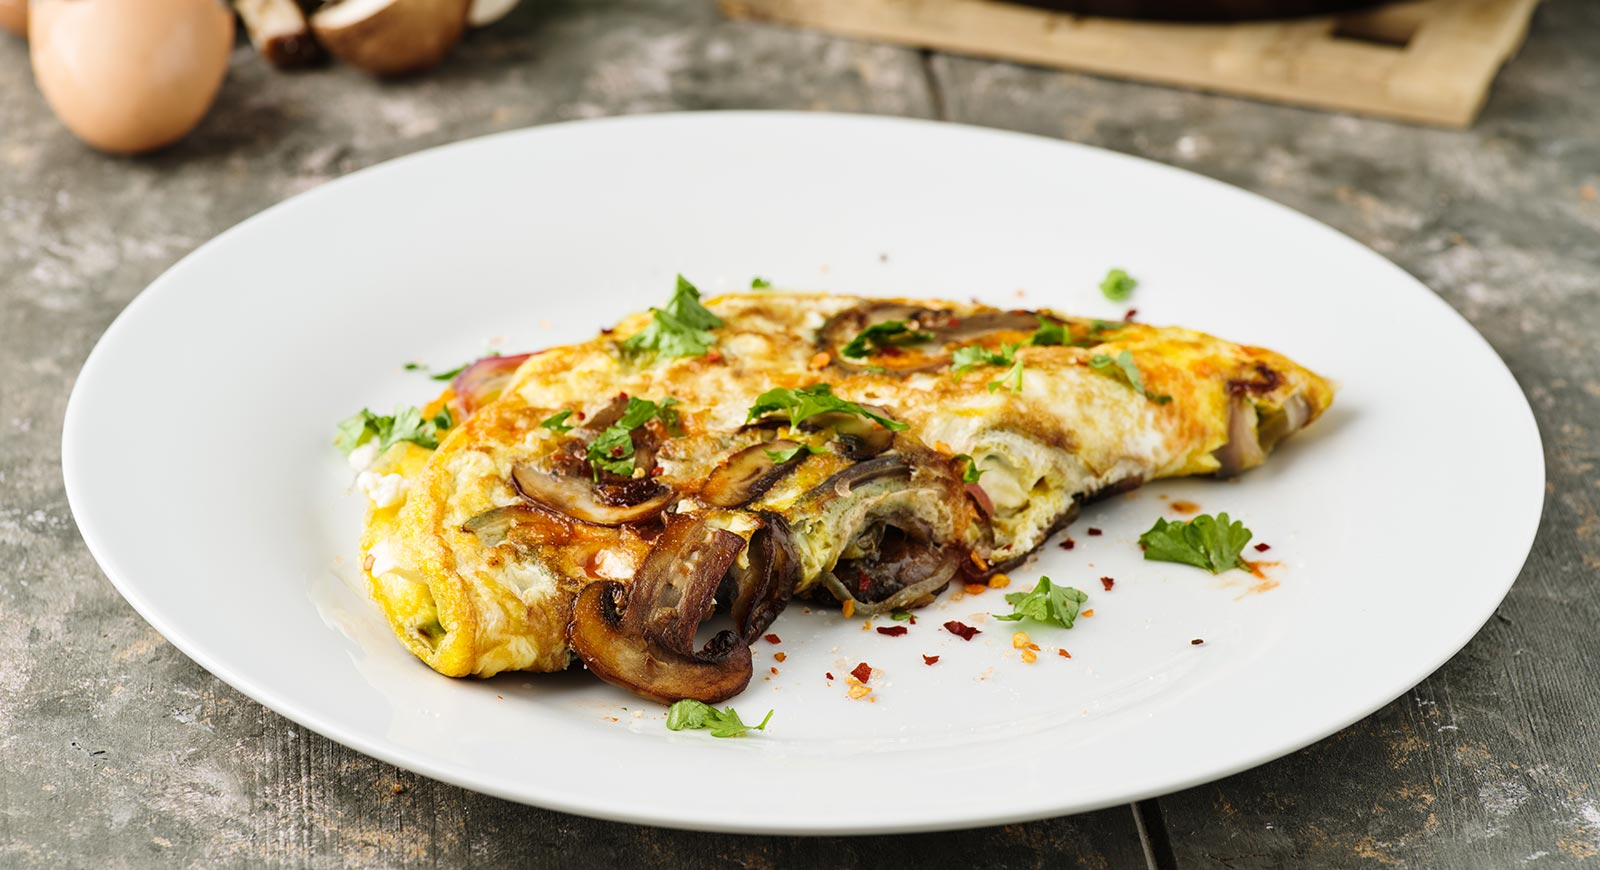 Hepsi Rezepte Omelett mit Käse und Pilzen